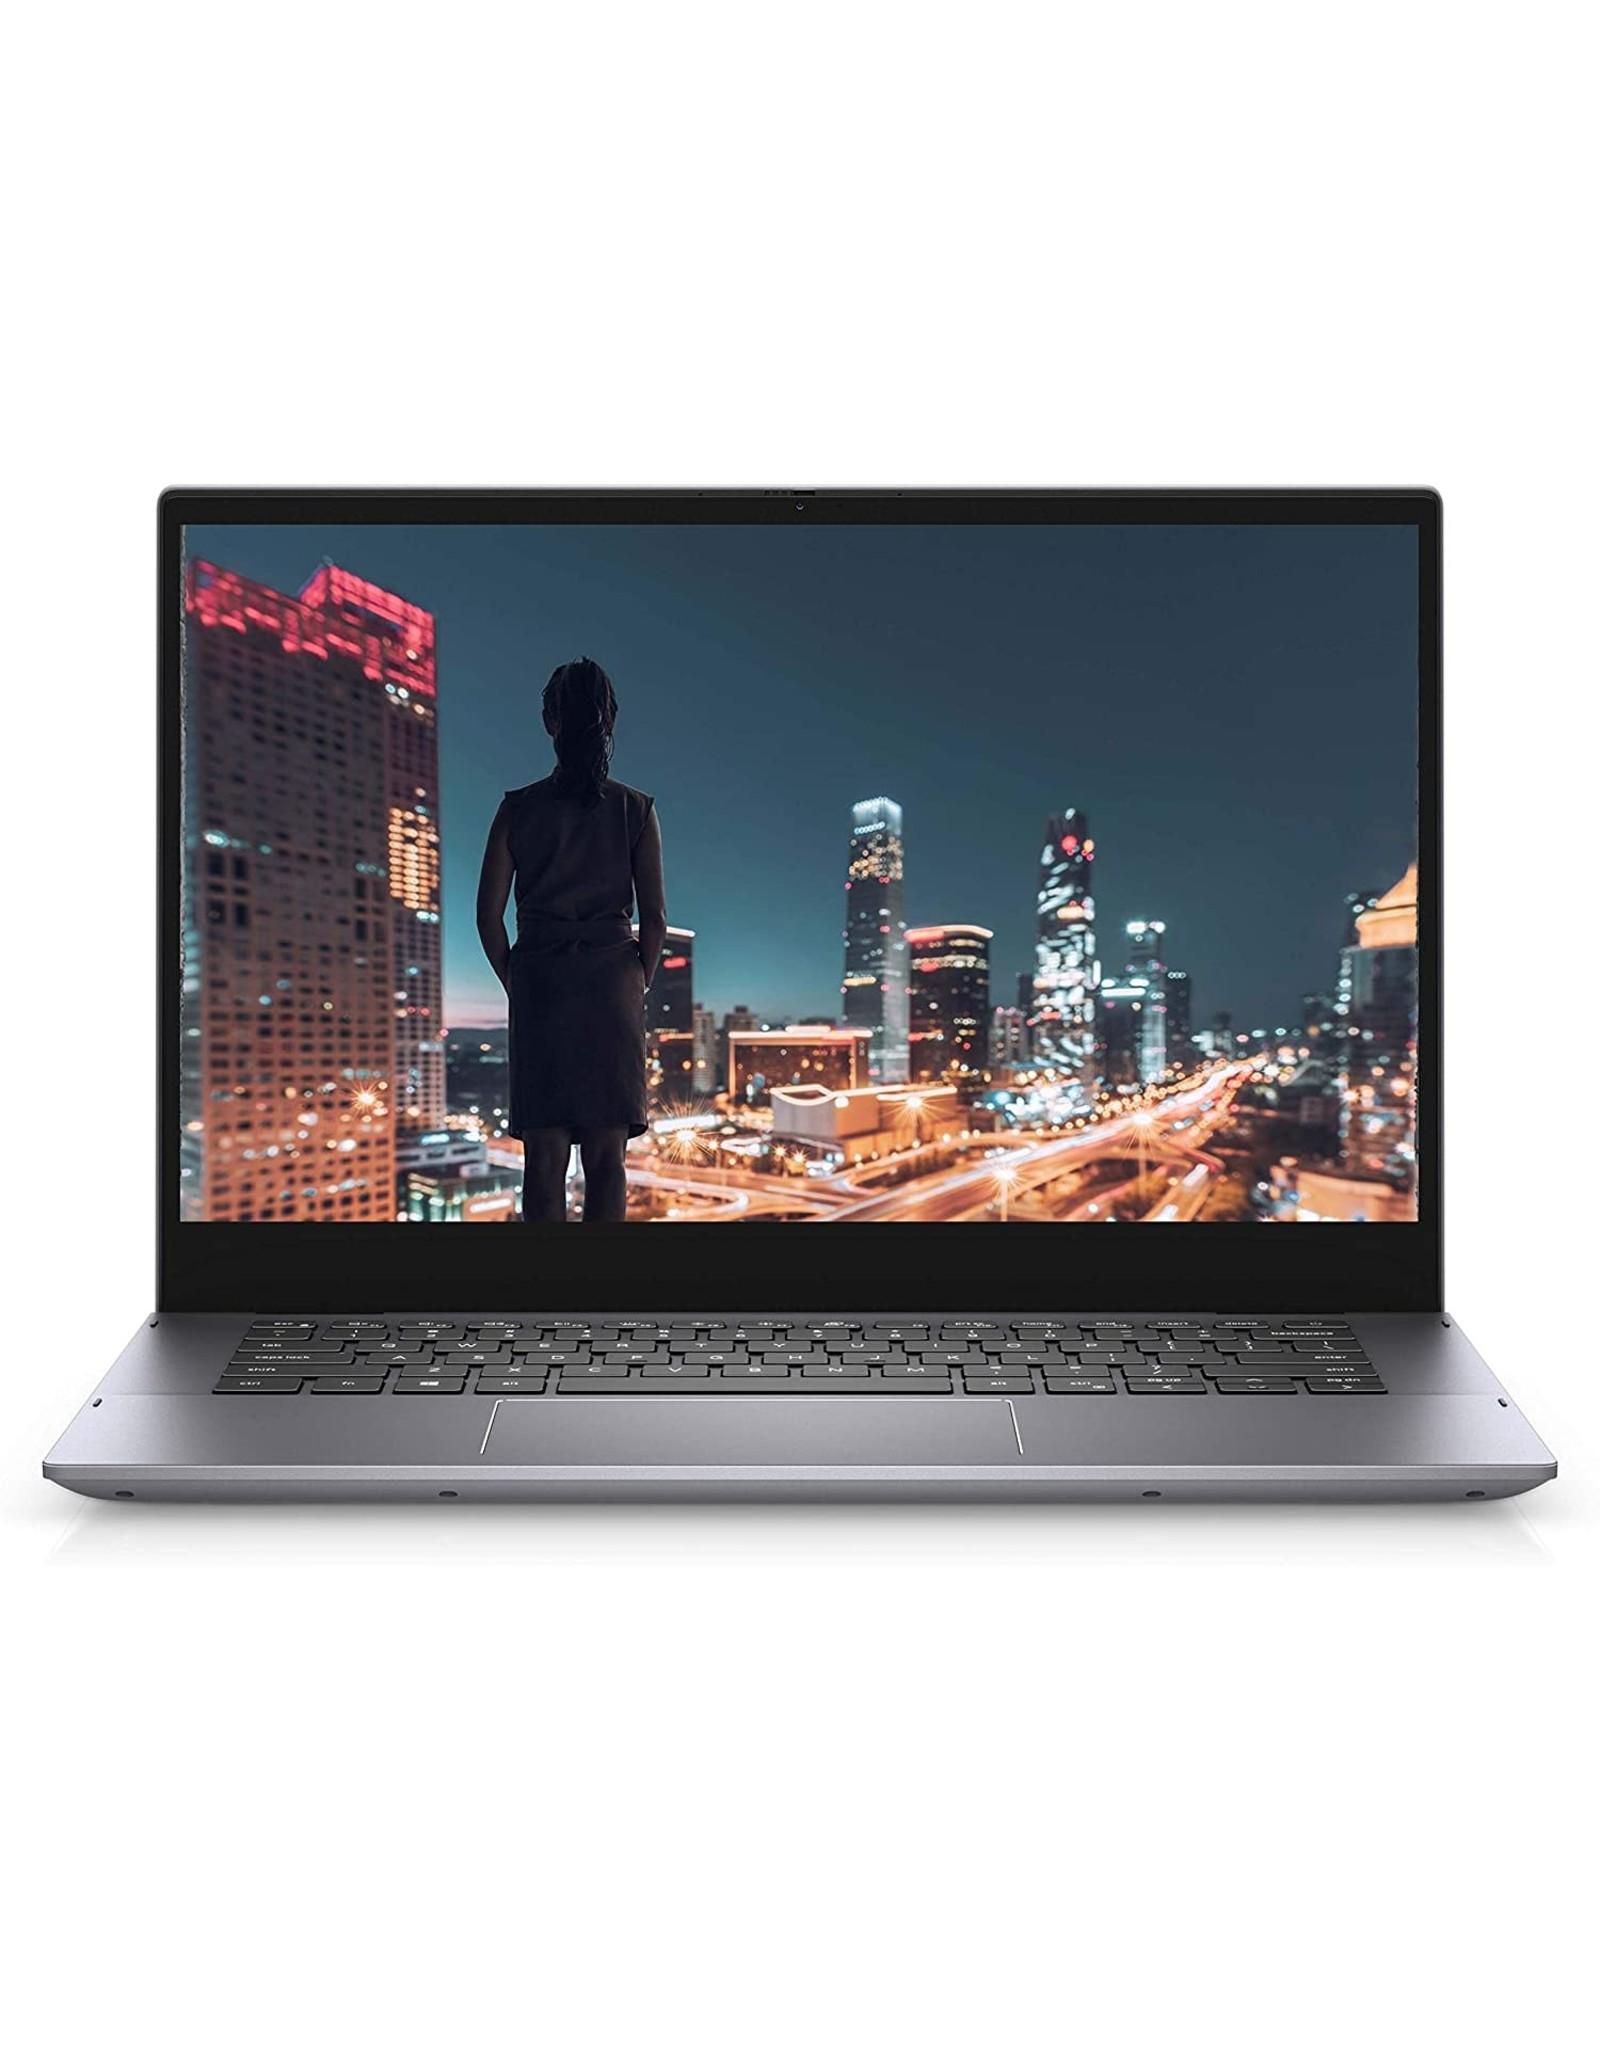 "DELL DELL INSPIRON 14 (5406) 2-N-1: 14"" FHD (1920 x 1080) TOUCH, 11TH GEN i7-1165G7, 12GB DDR4, 512GB, WINDOWS 10 HOME, 720HD WEBCAM, INTEL IRIS Xe GRAPHICS, 1 YR"